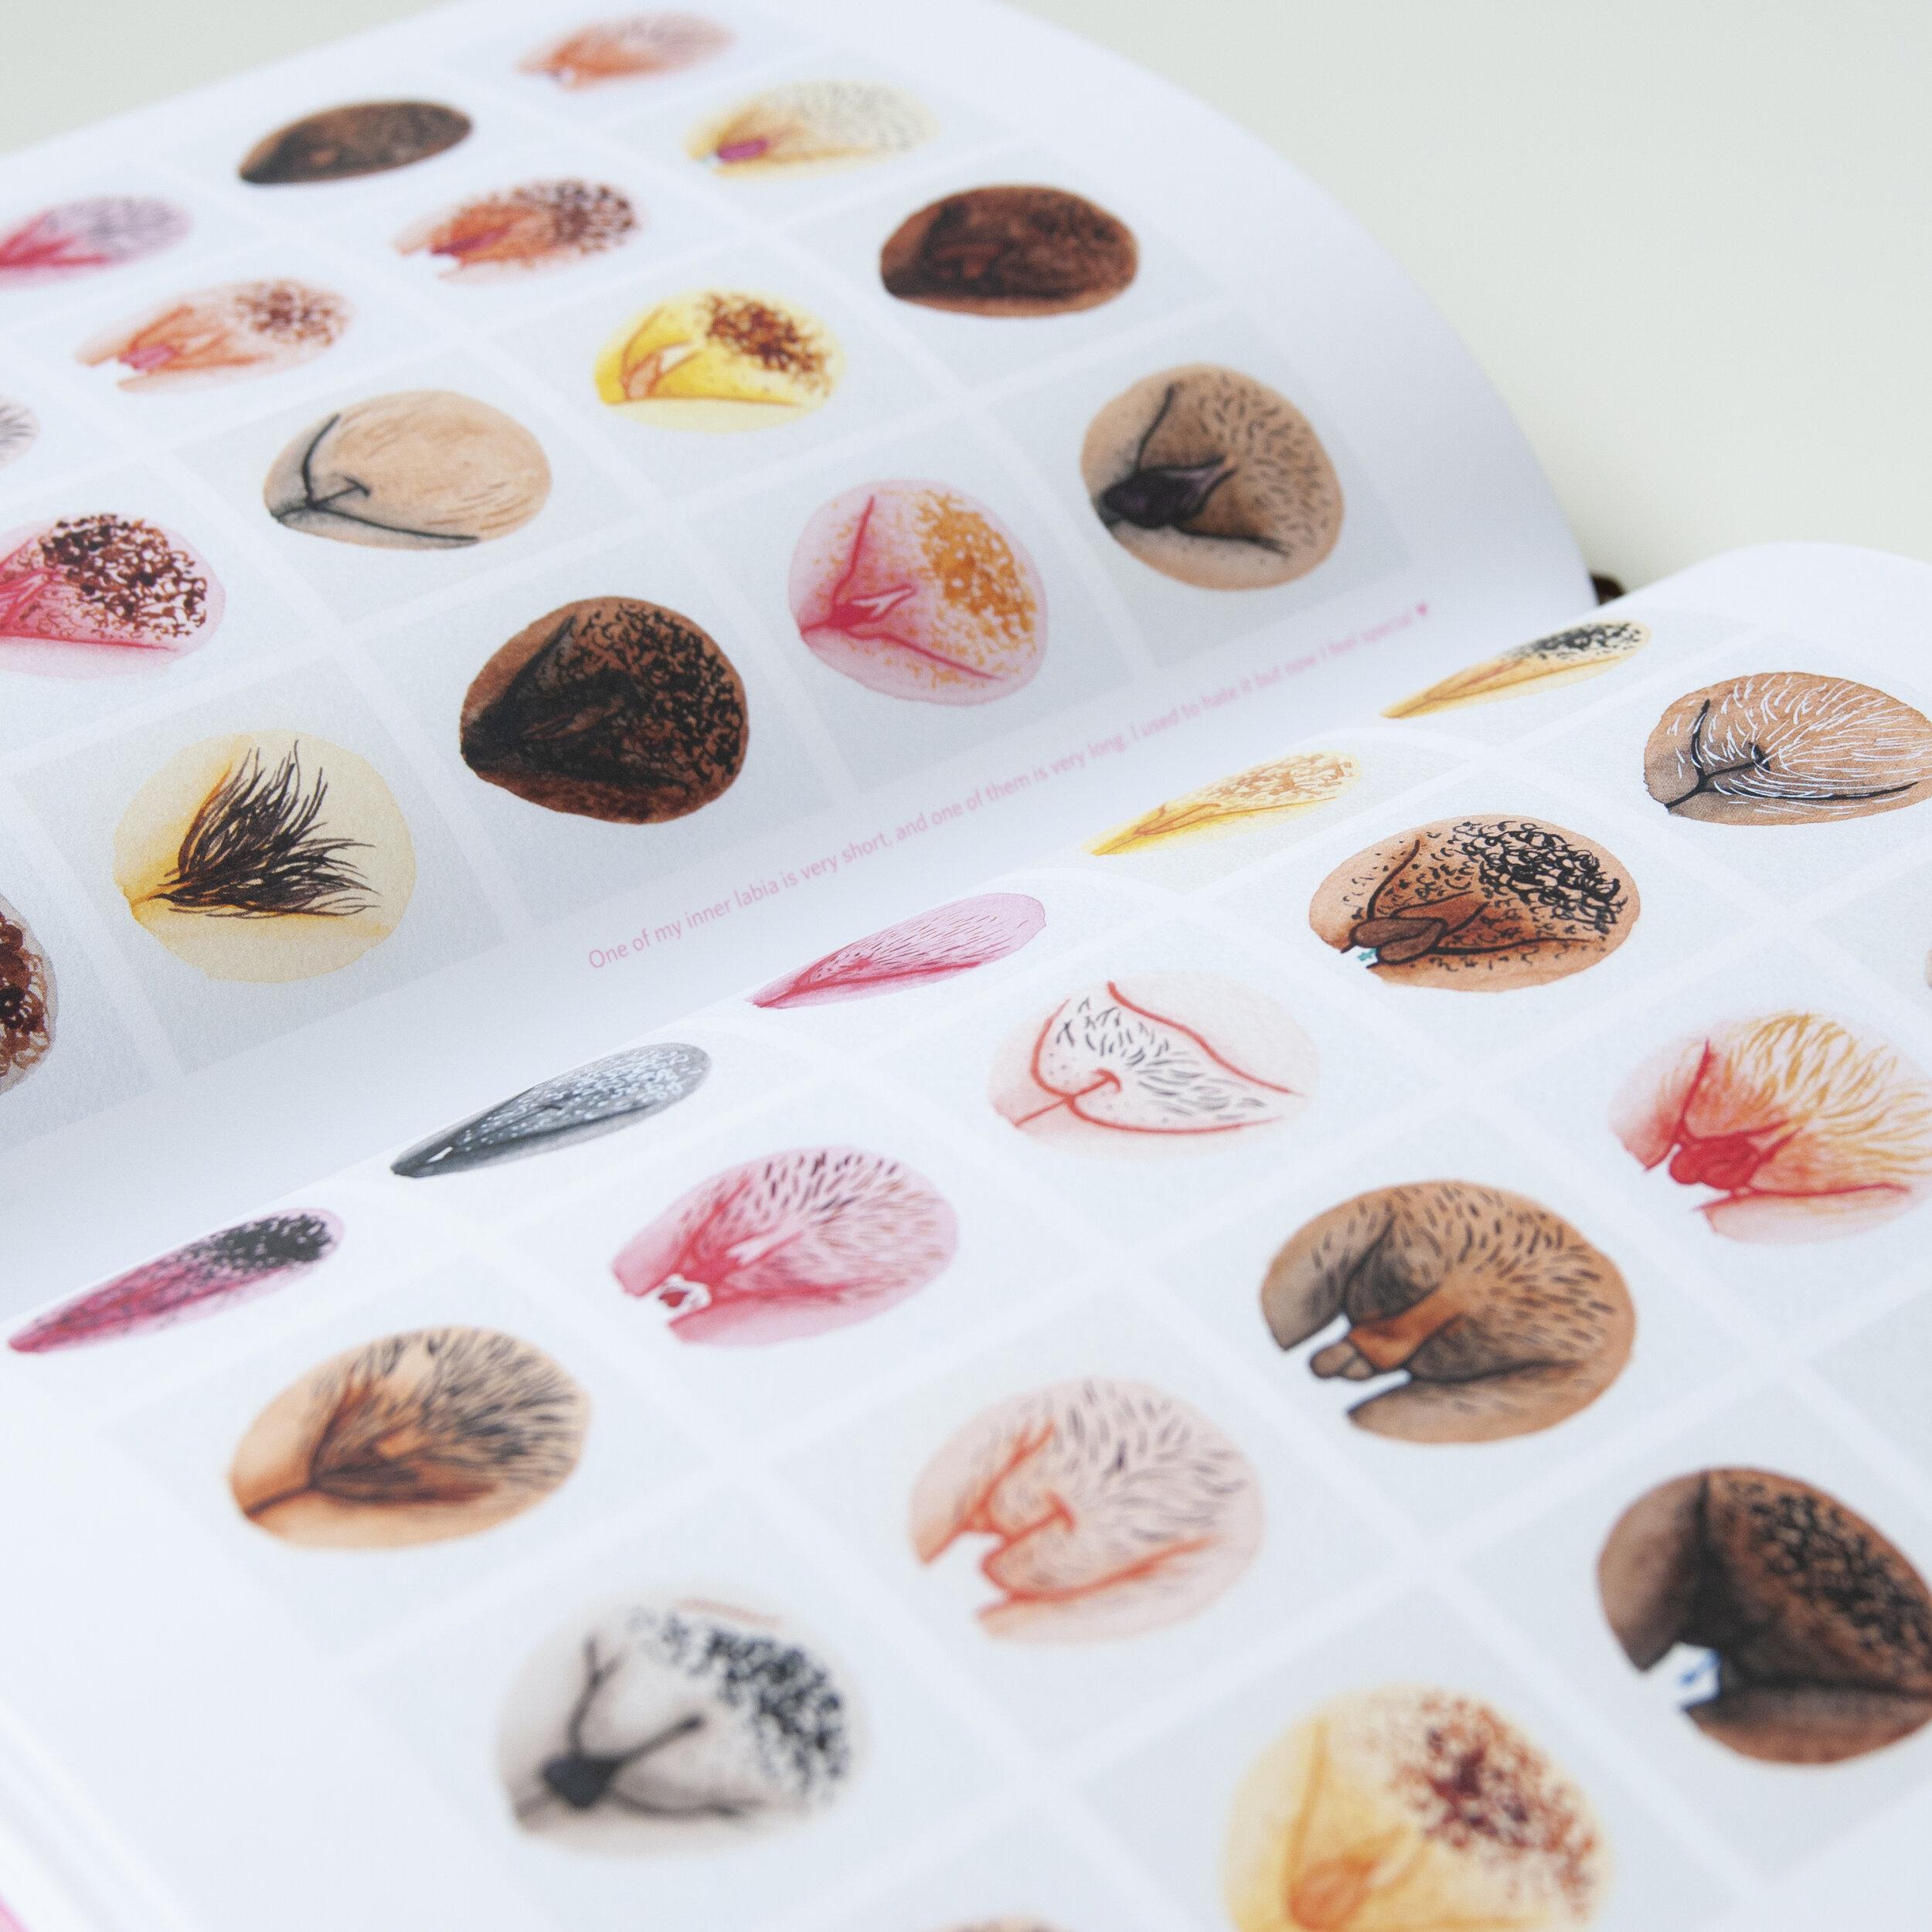 A Celebration of Vulva Diversity - A book by The Vulva